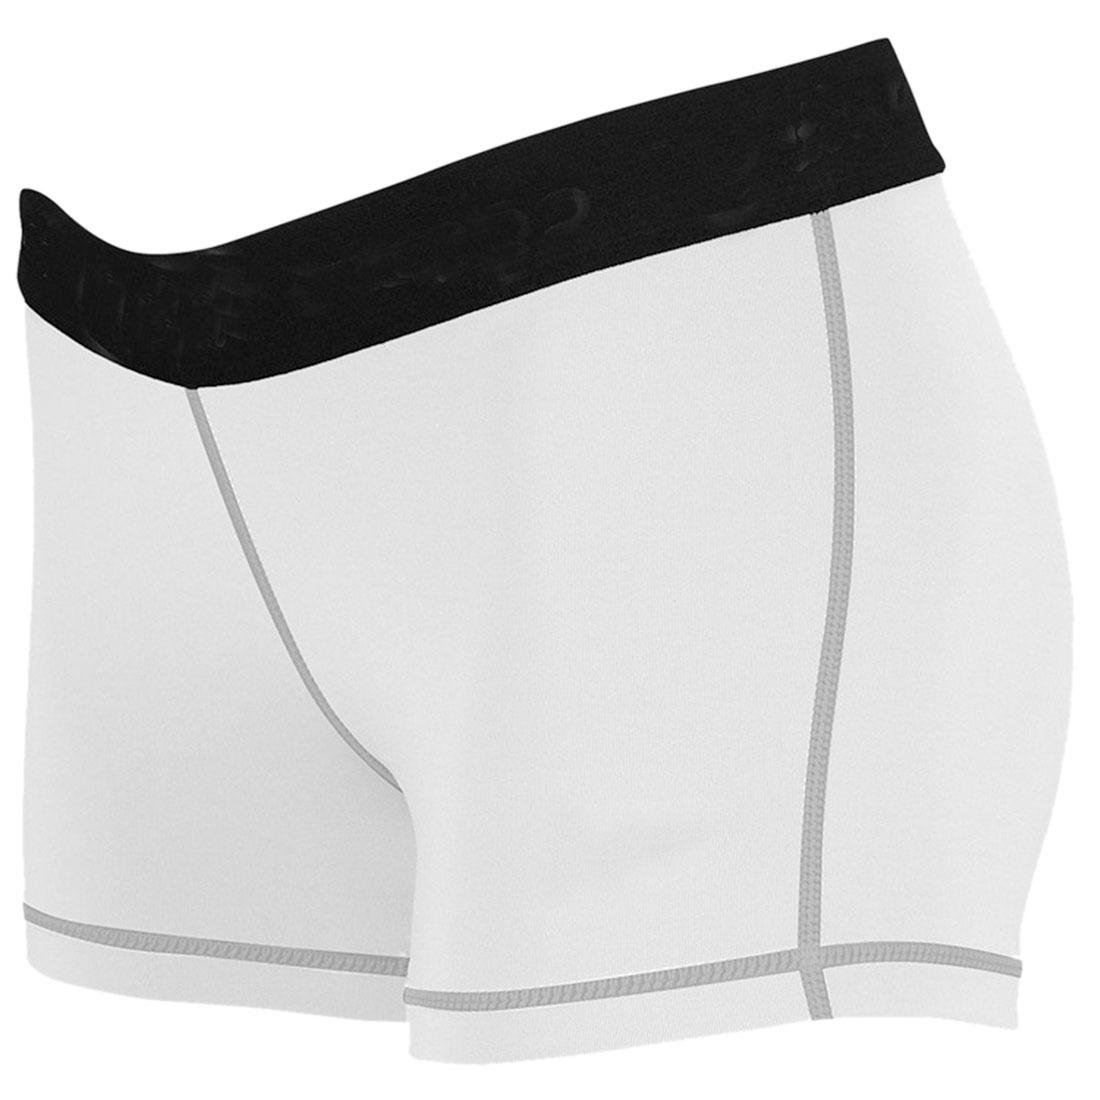 Mens Compression Fitness Short Pants Leggings Gym shorts sports Base Under Layer